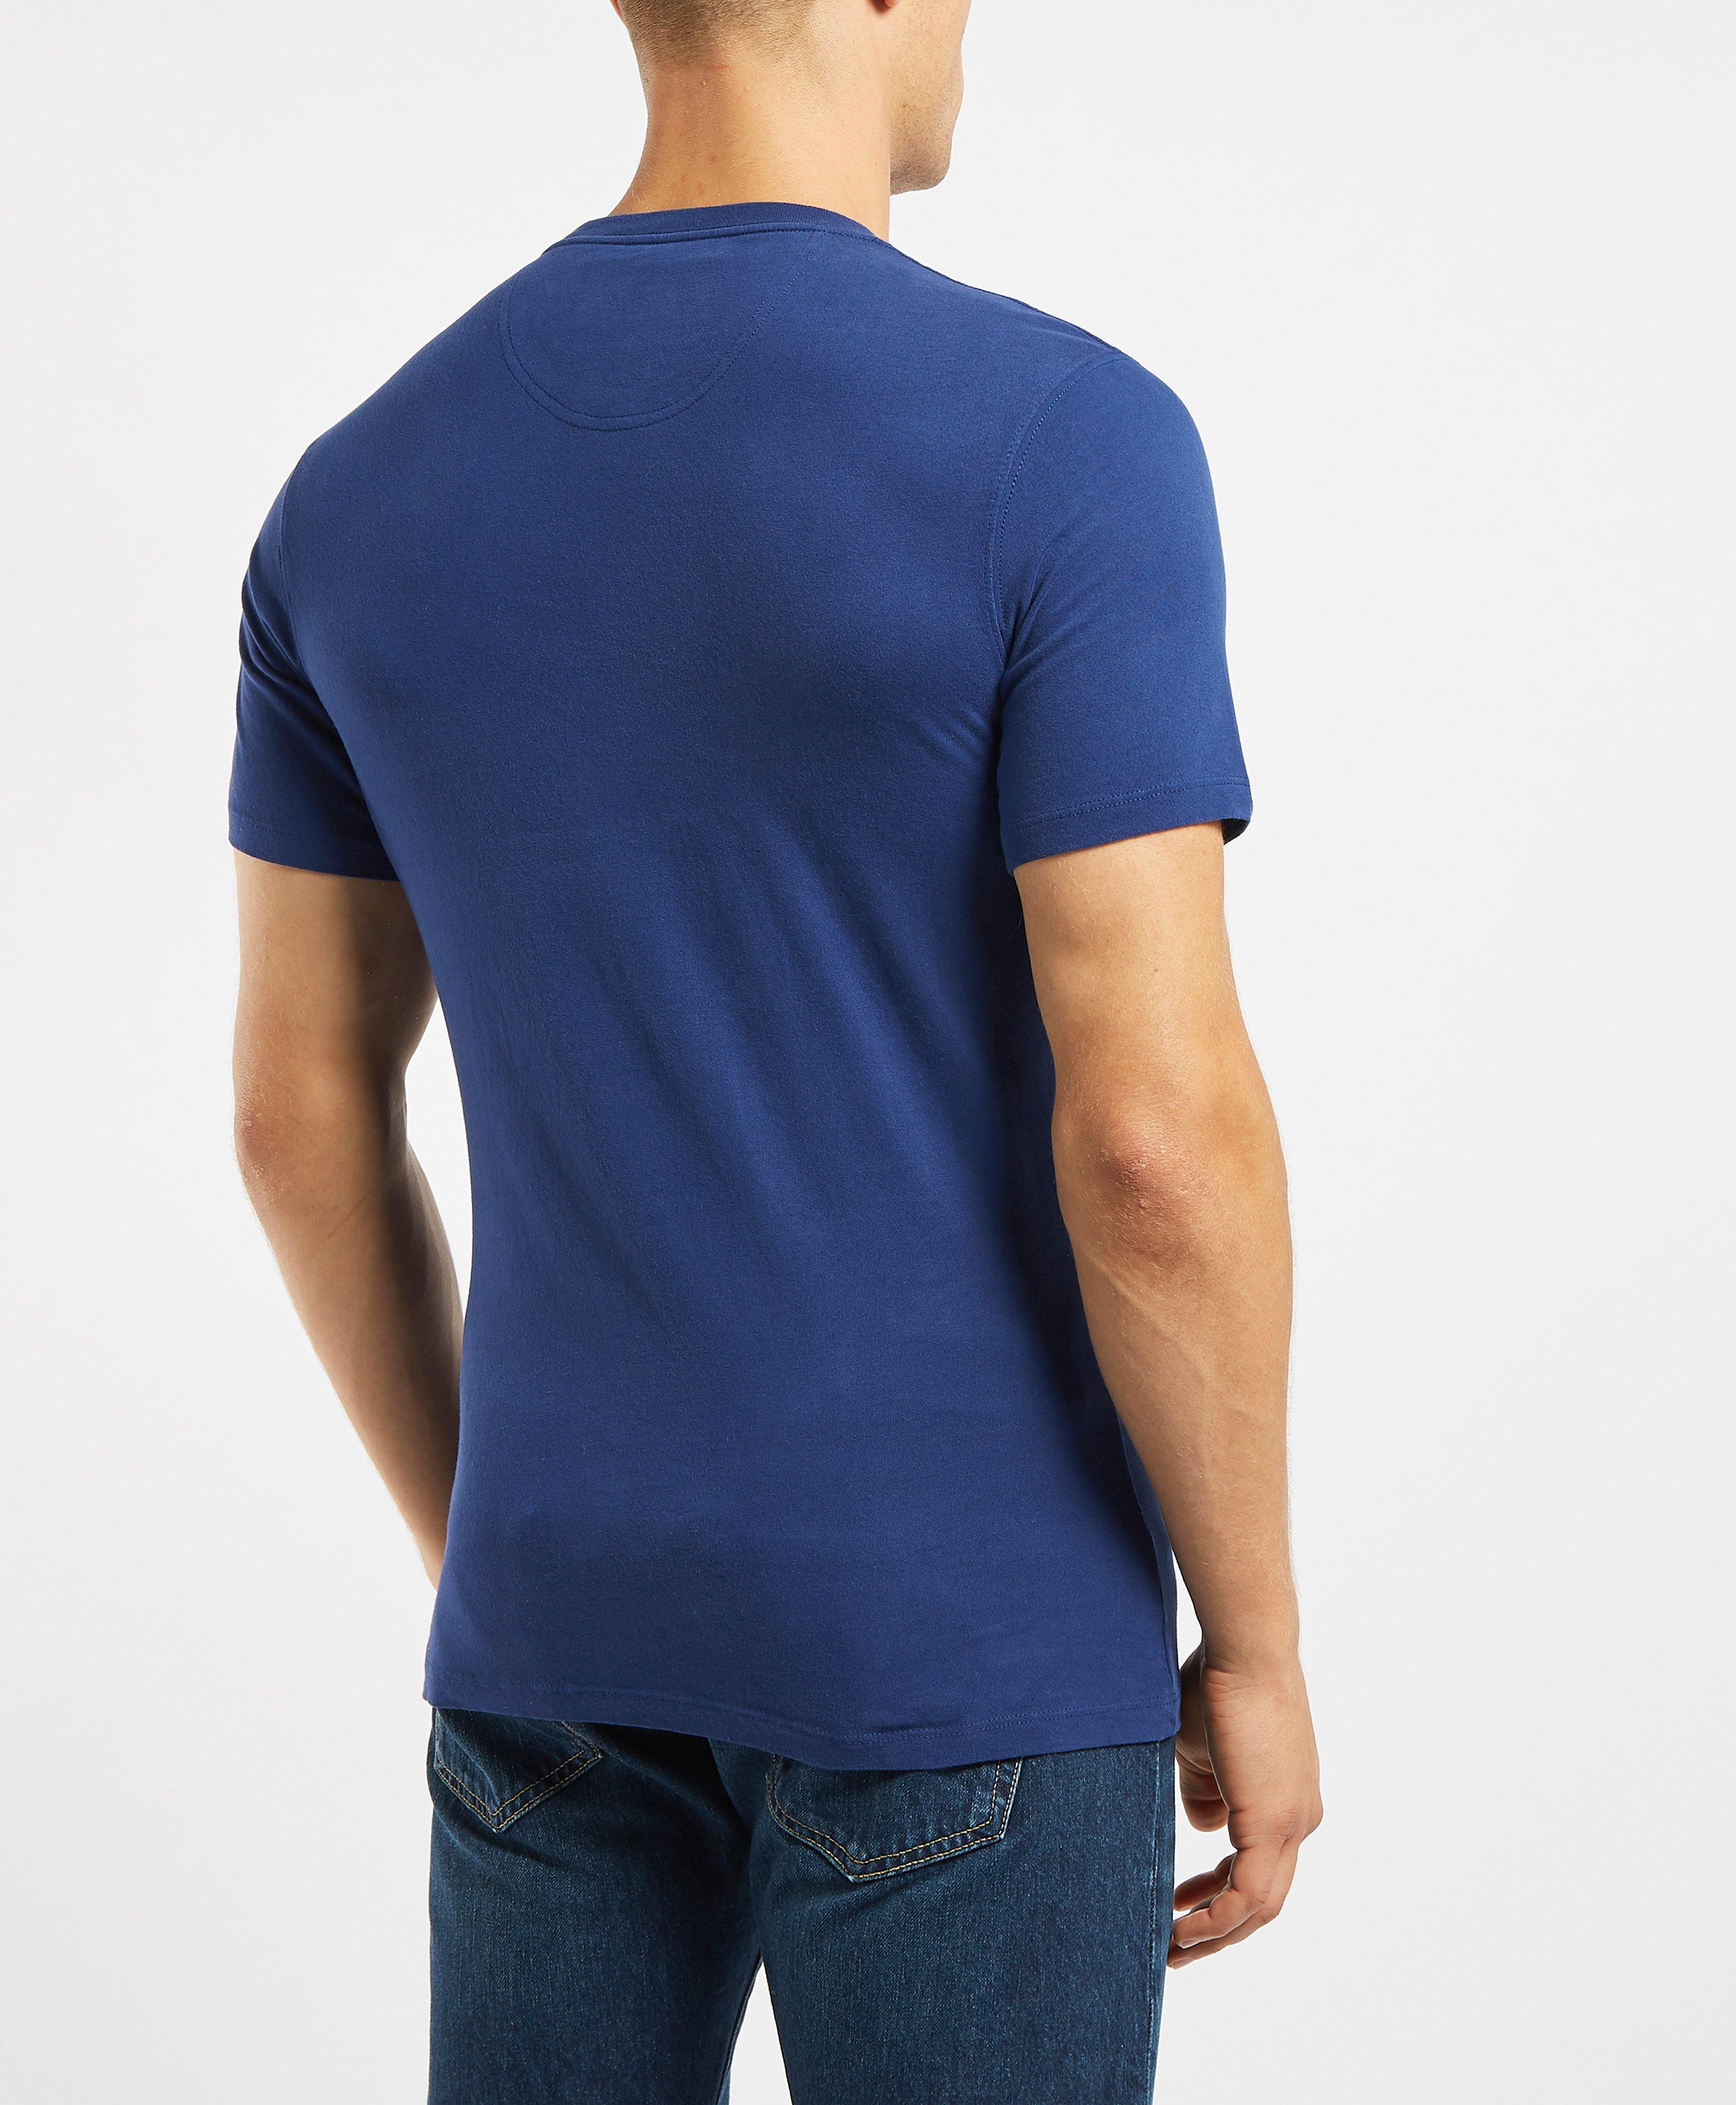 3a2f1f59f Lyst - Barbour Mens International X Steve Mcqueen Short Sleeve T-shirt Blue  in Blue for Men - Save 29.16666666666667%